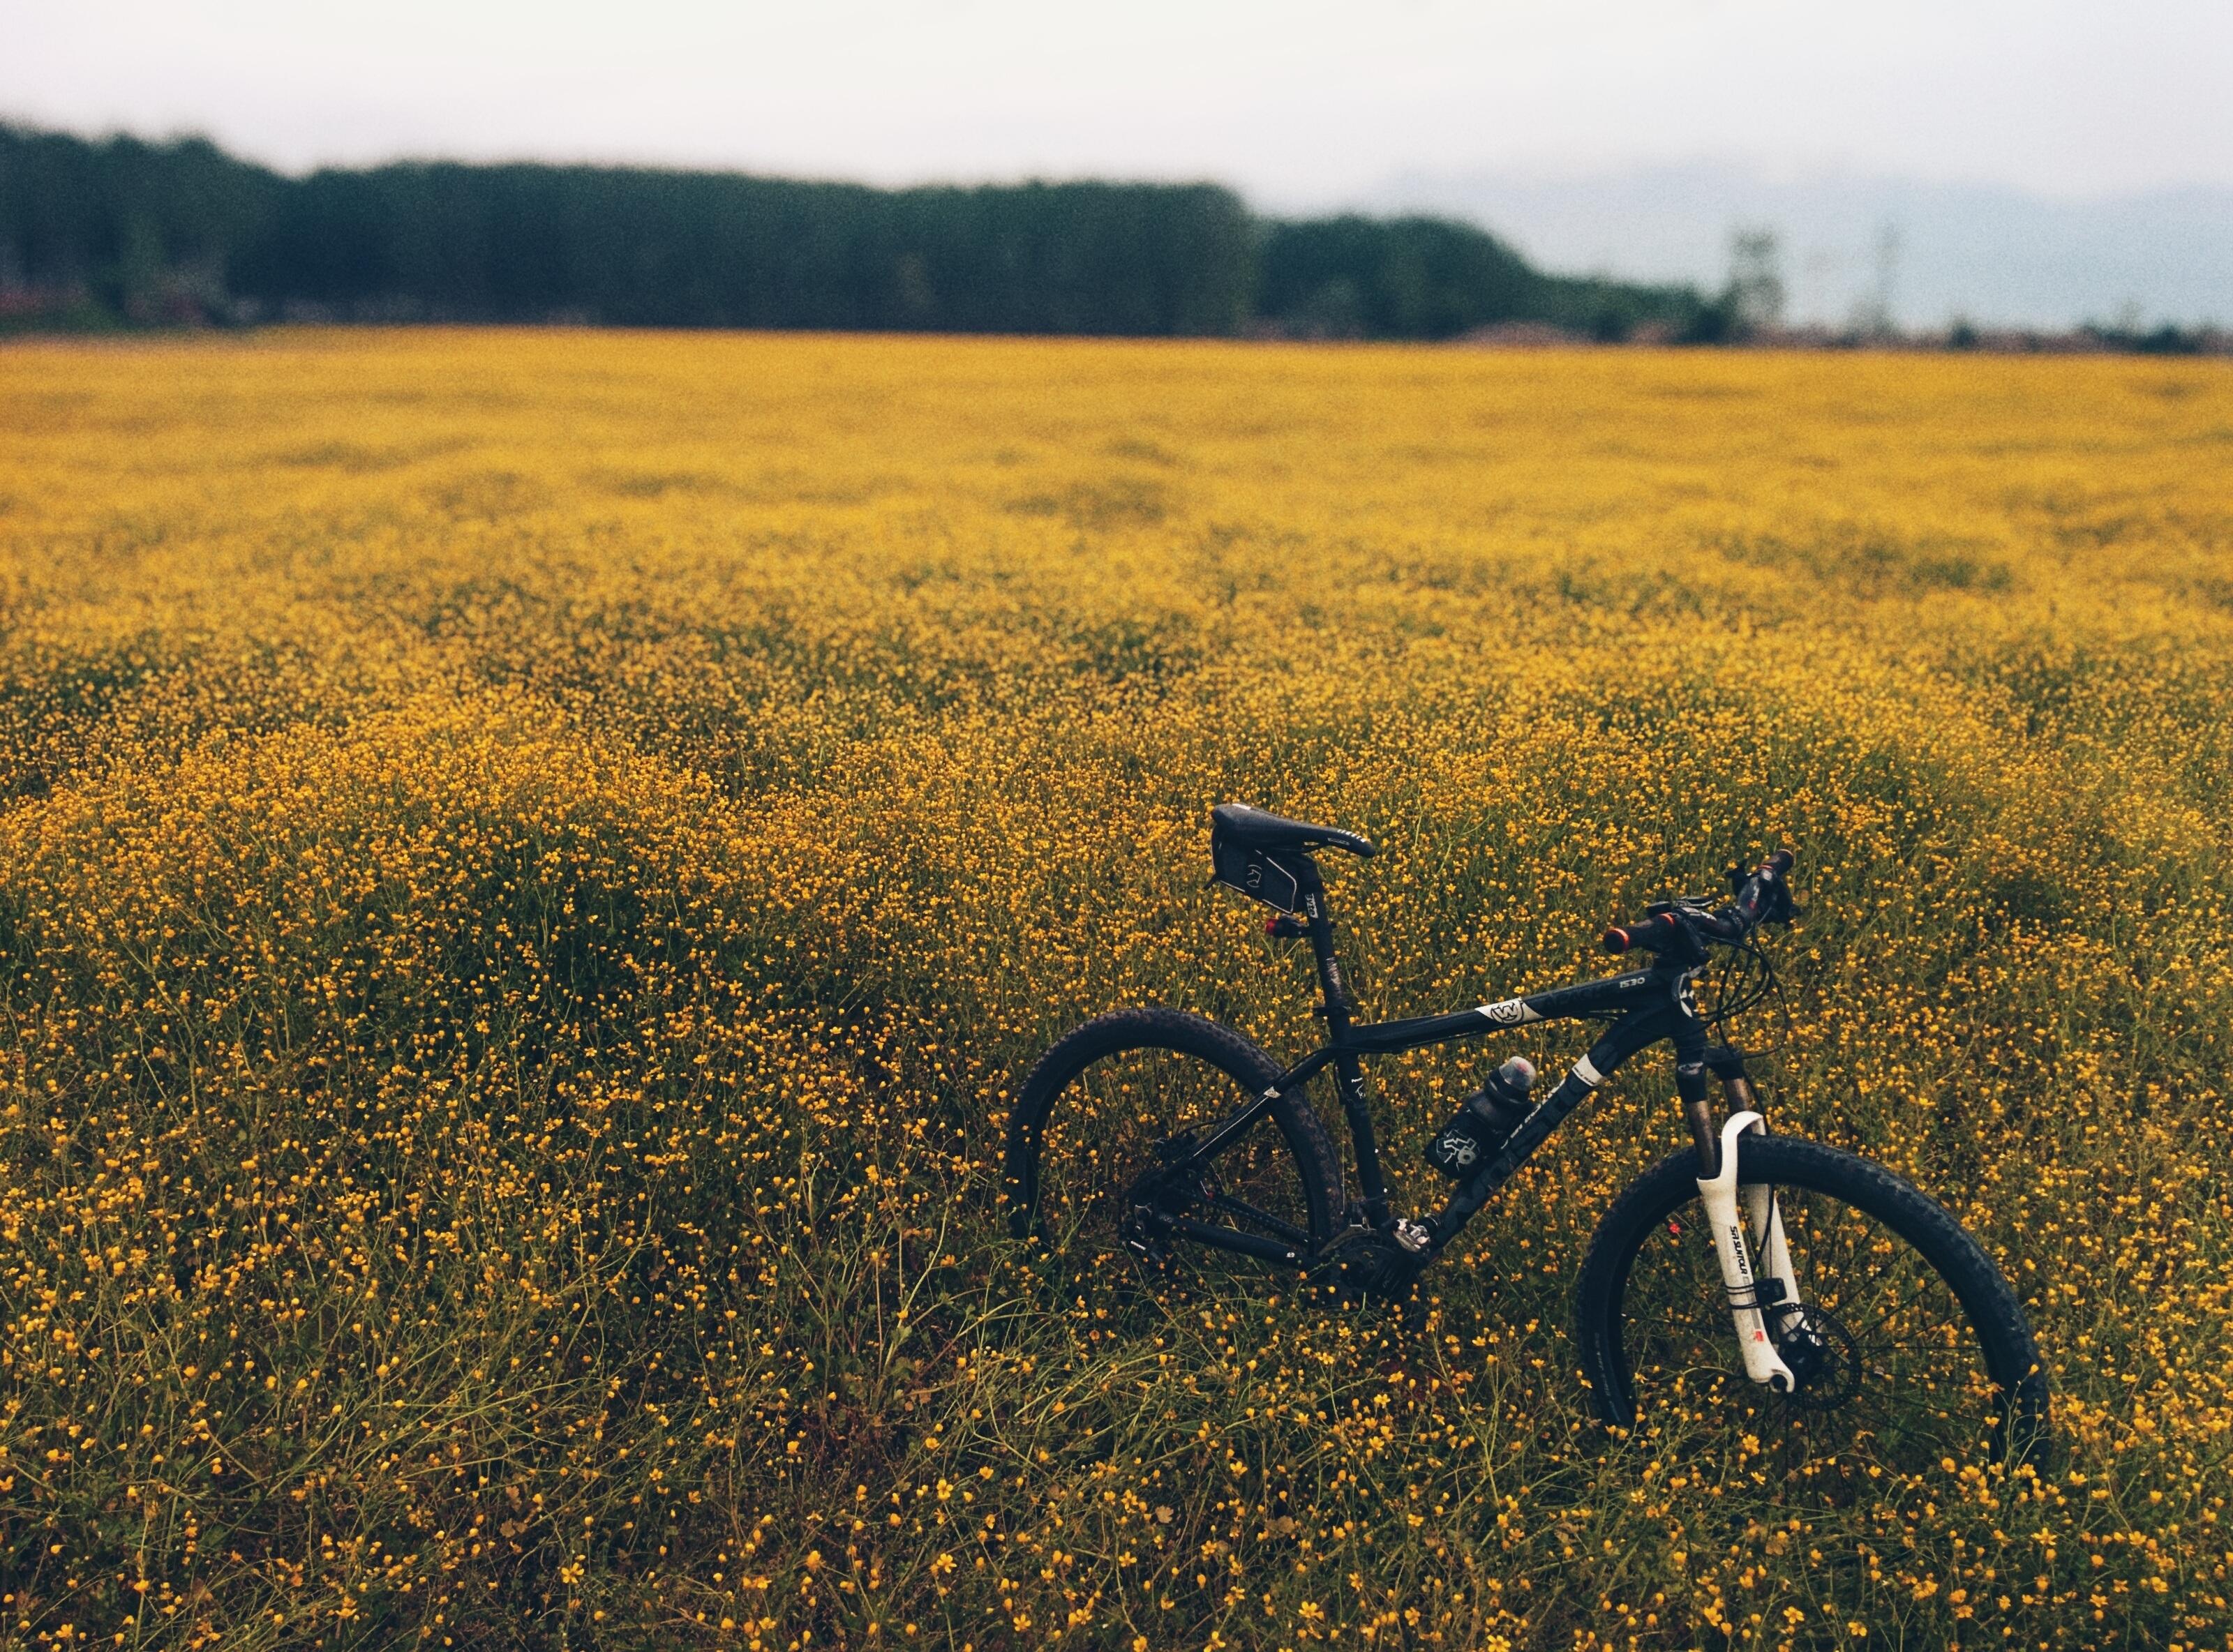 free images   landscape  outdoor  horizon  meadow  prairie  morning  flower  bicycle  bike